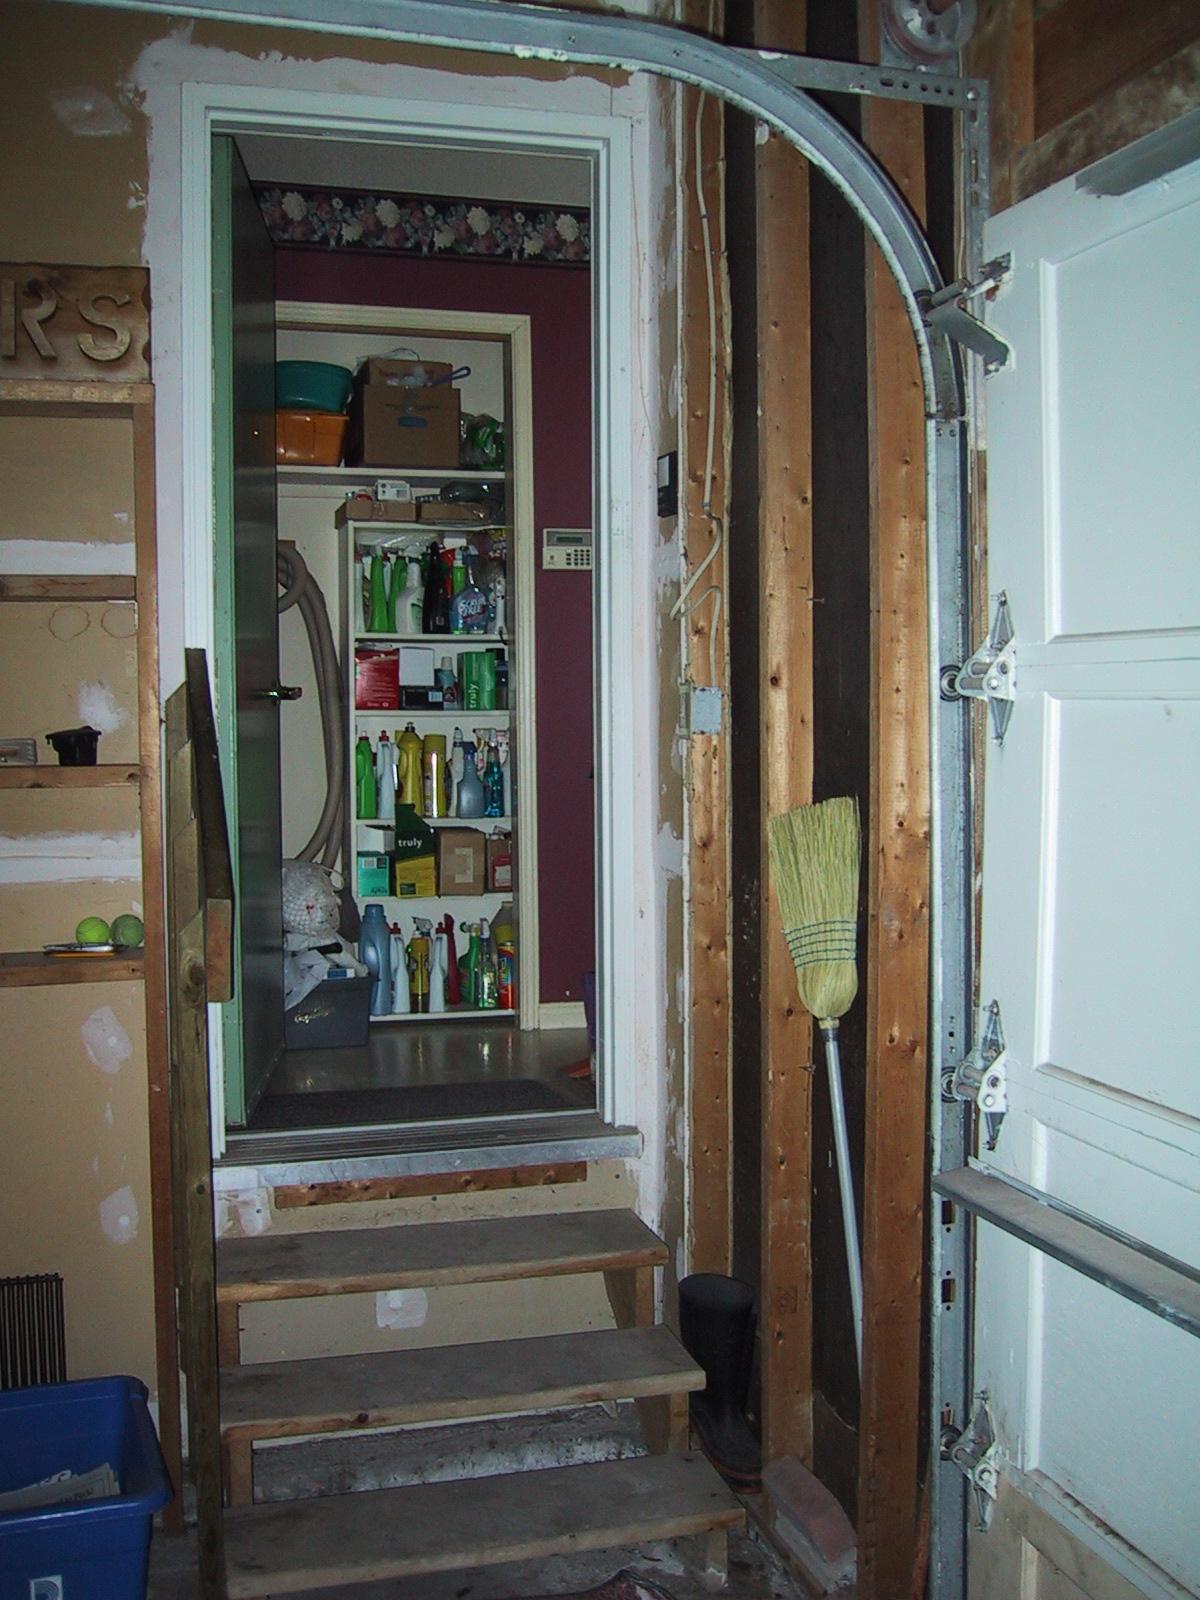 Home Renovation Tip U2013 Wheelchair Access U2013 Between Garage And Laundry Room